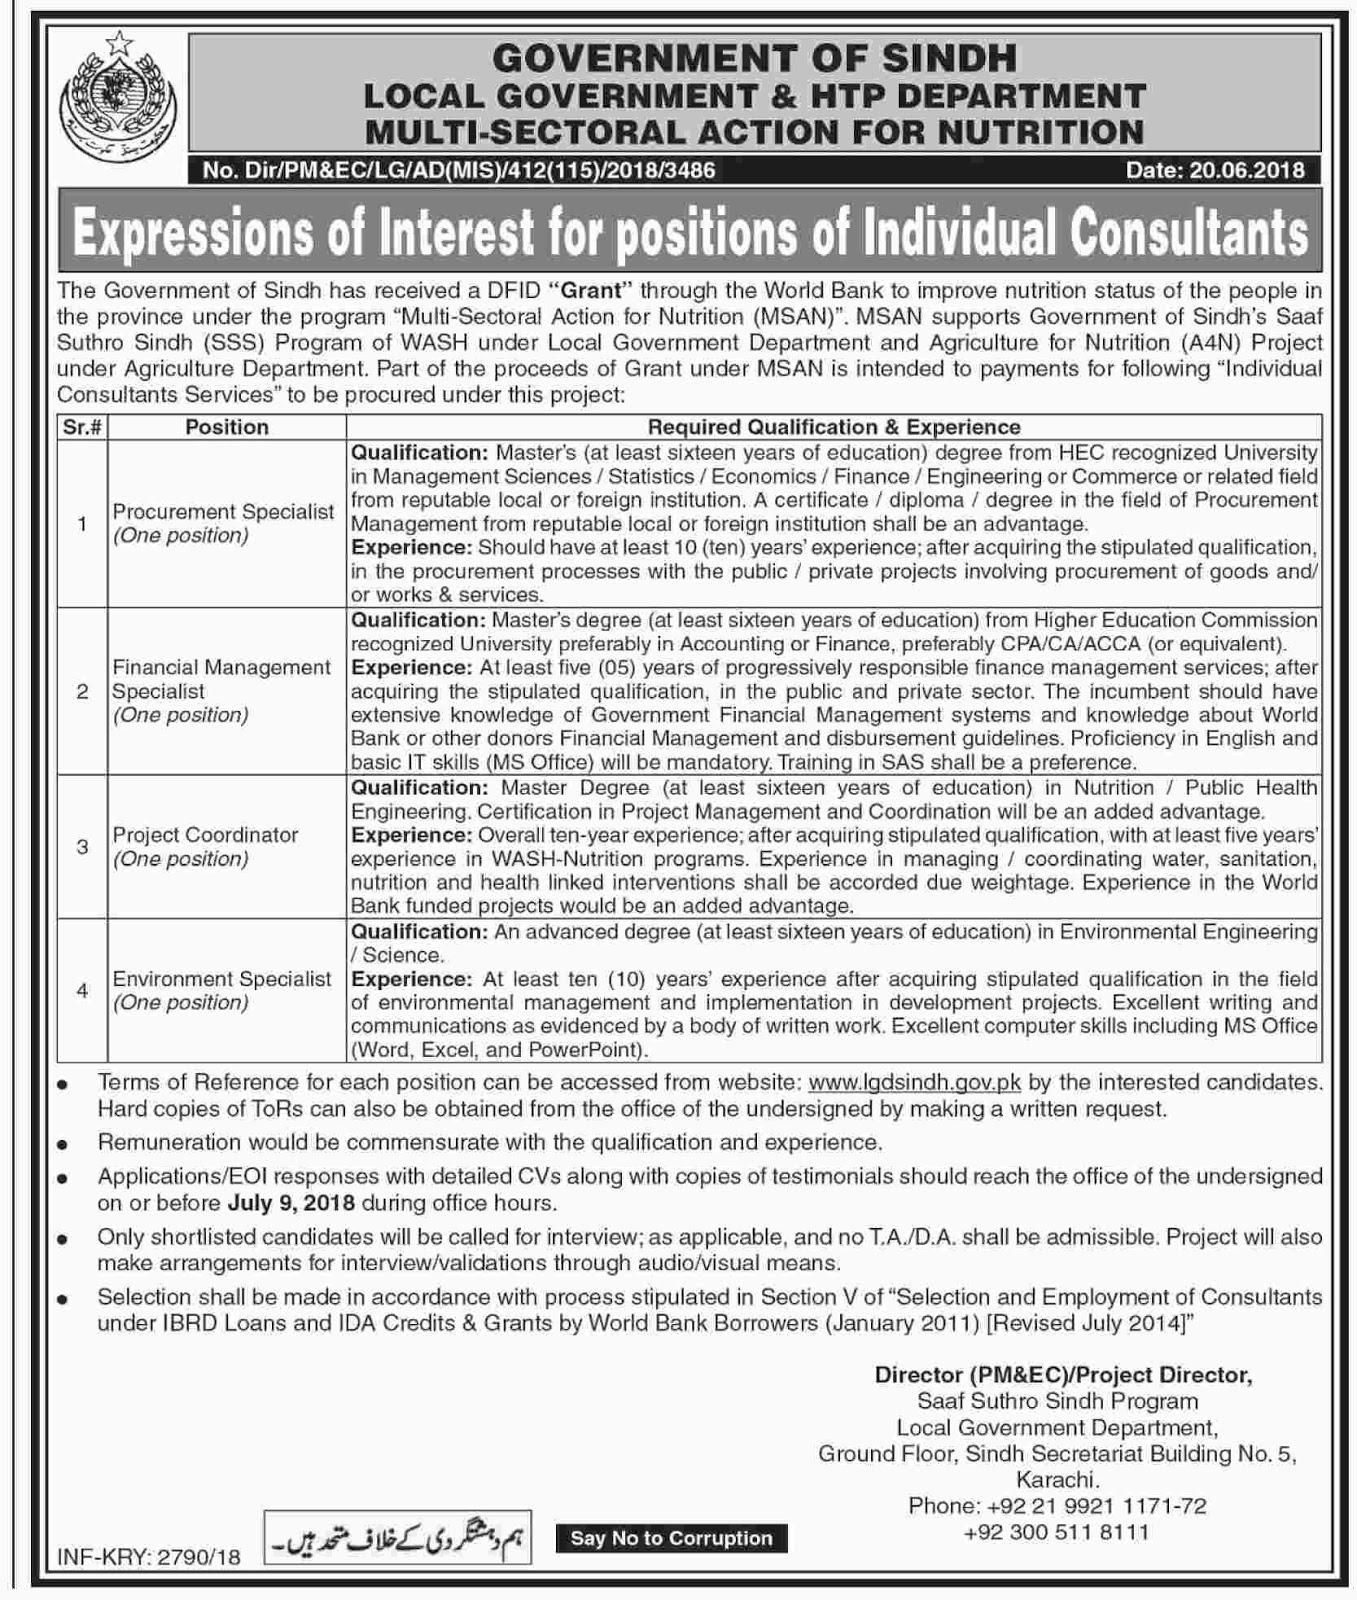 HTP Department Govt of Sindh